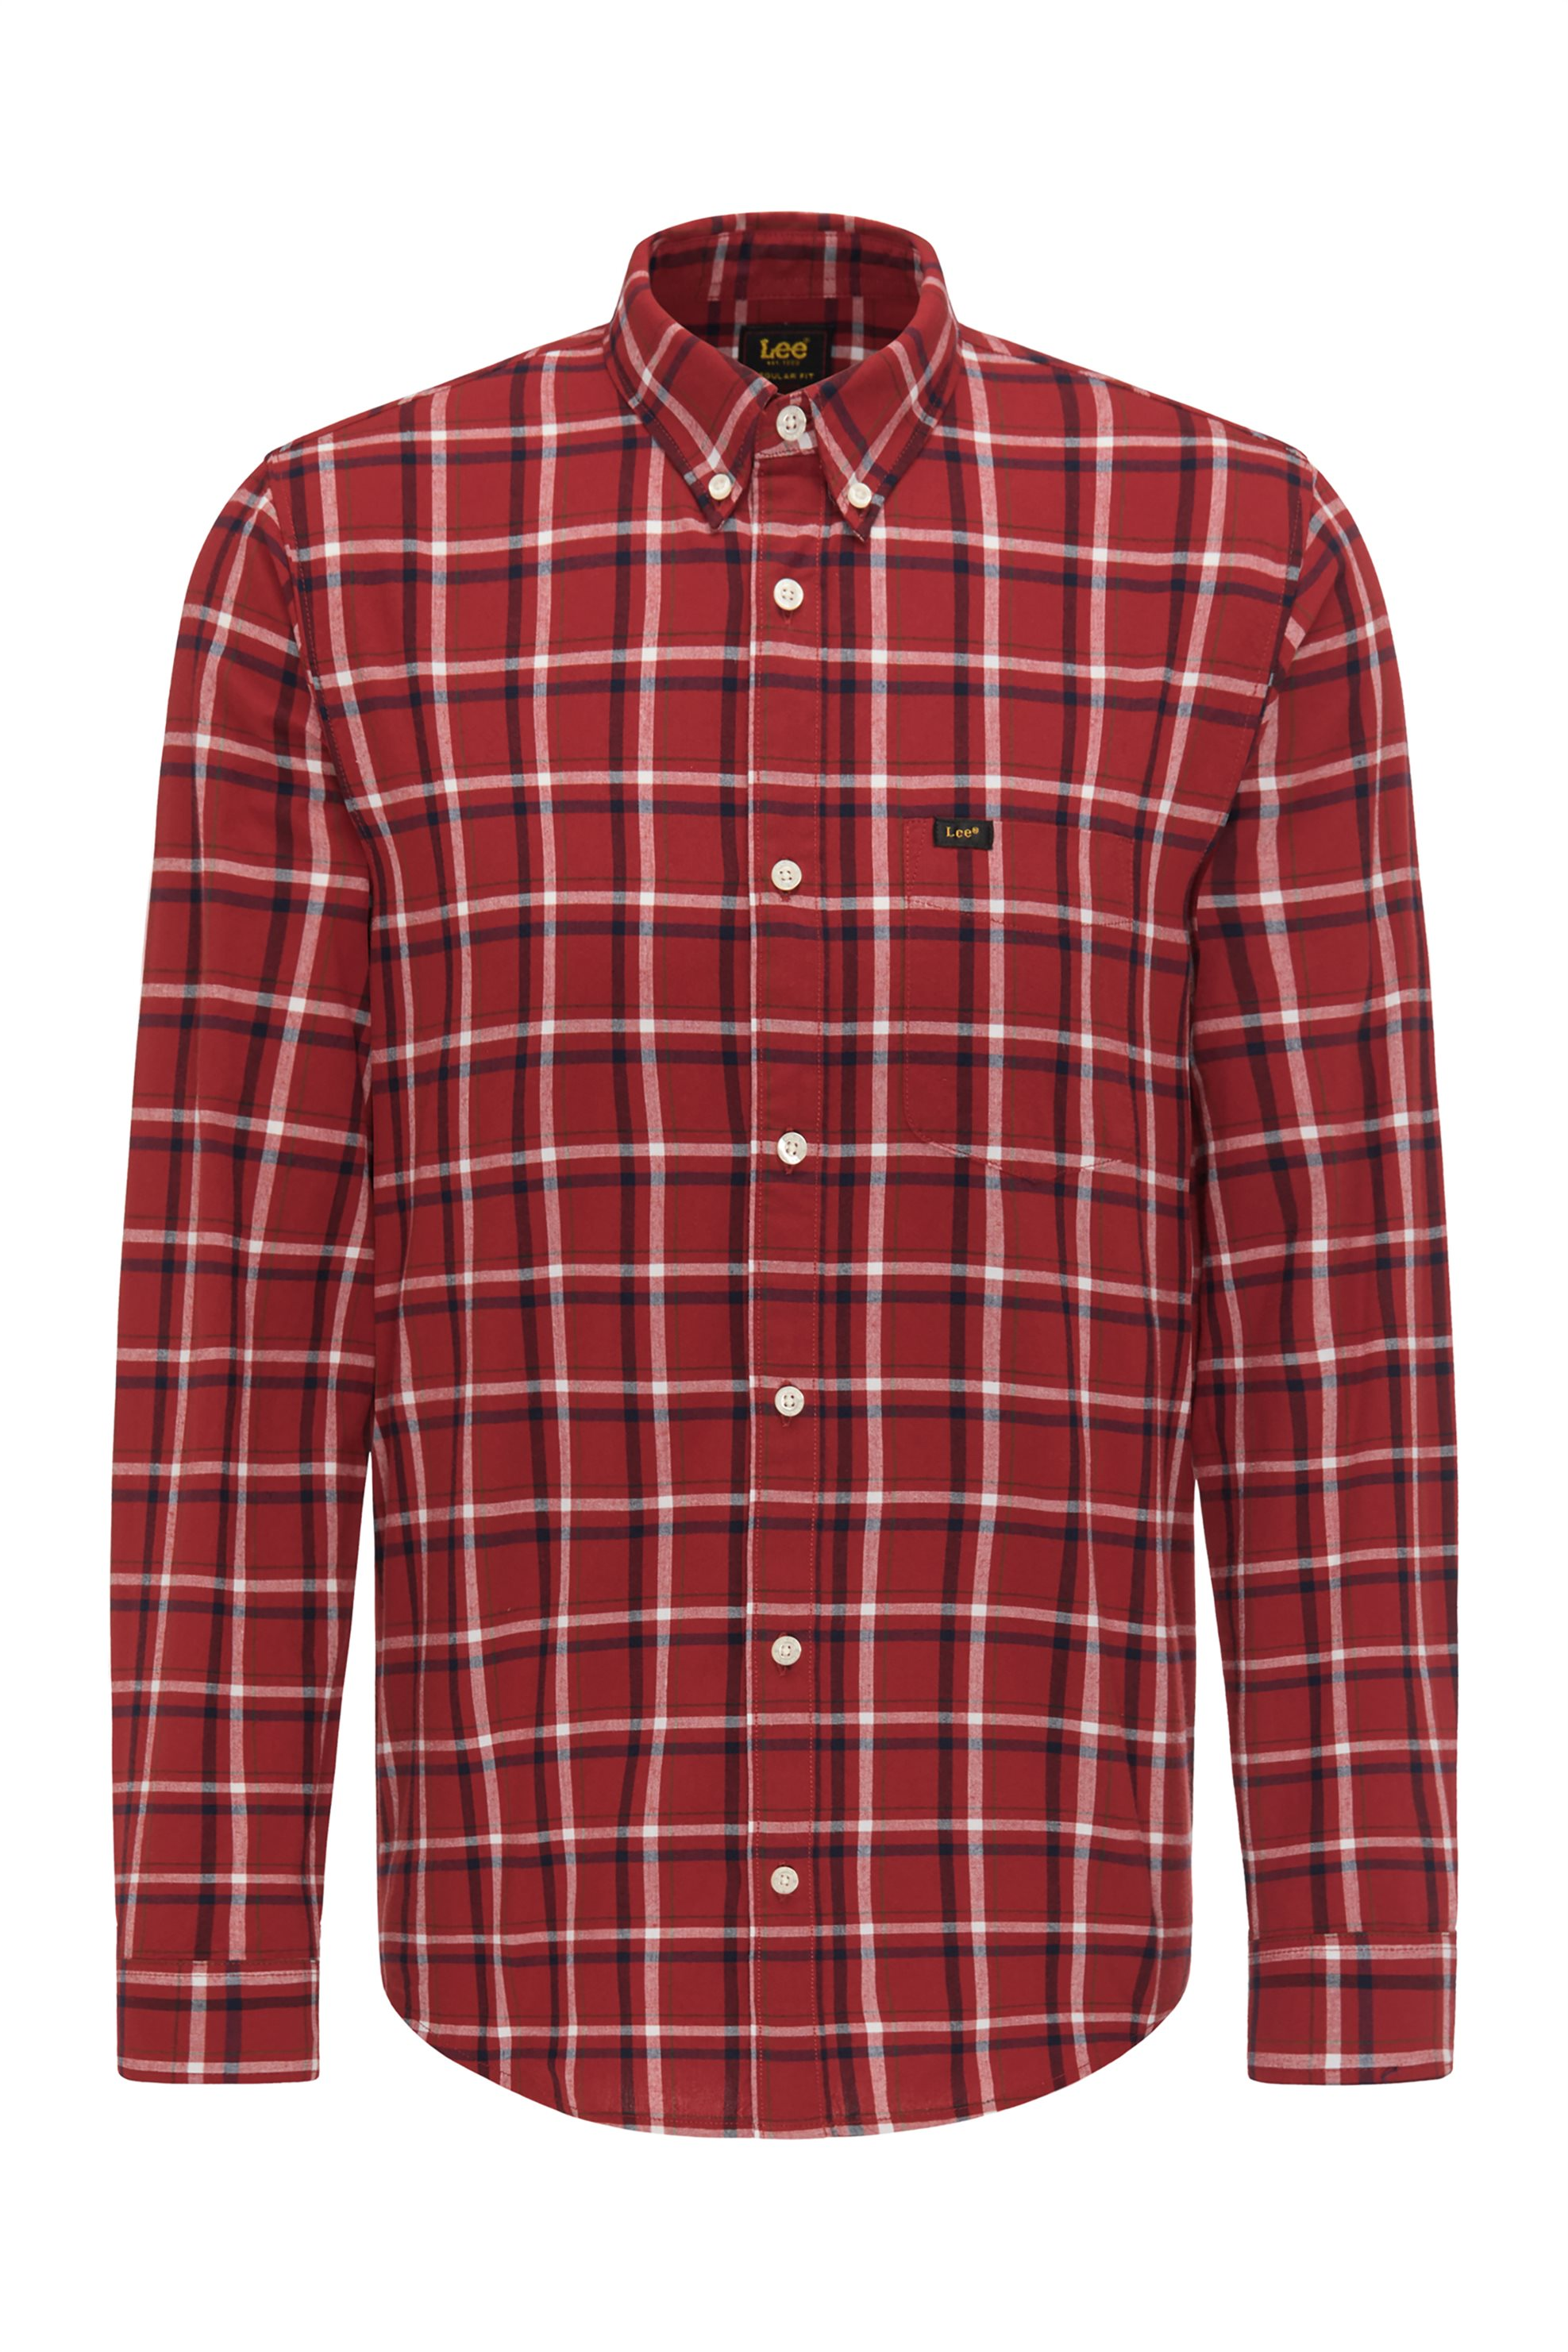 Lee ανδρικό πουκάμισο καρό με απλικέ τσέπη - L880RNOE - Κεραμιδί